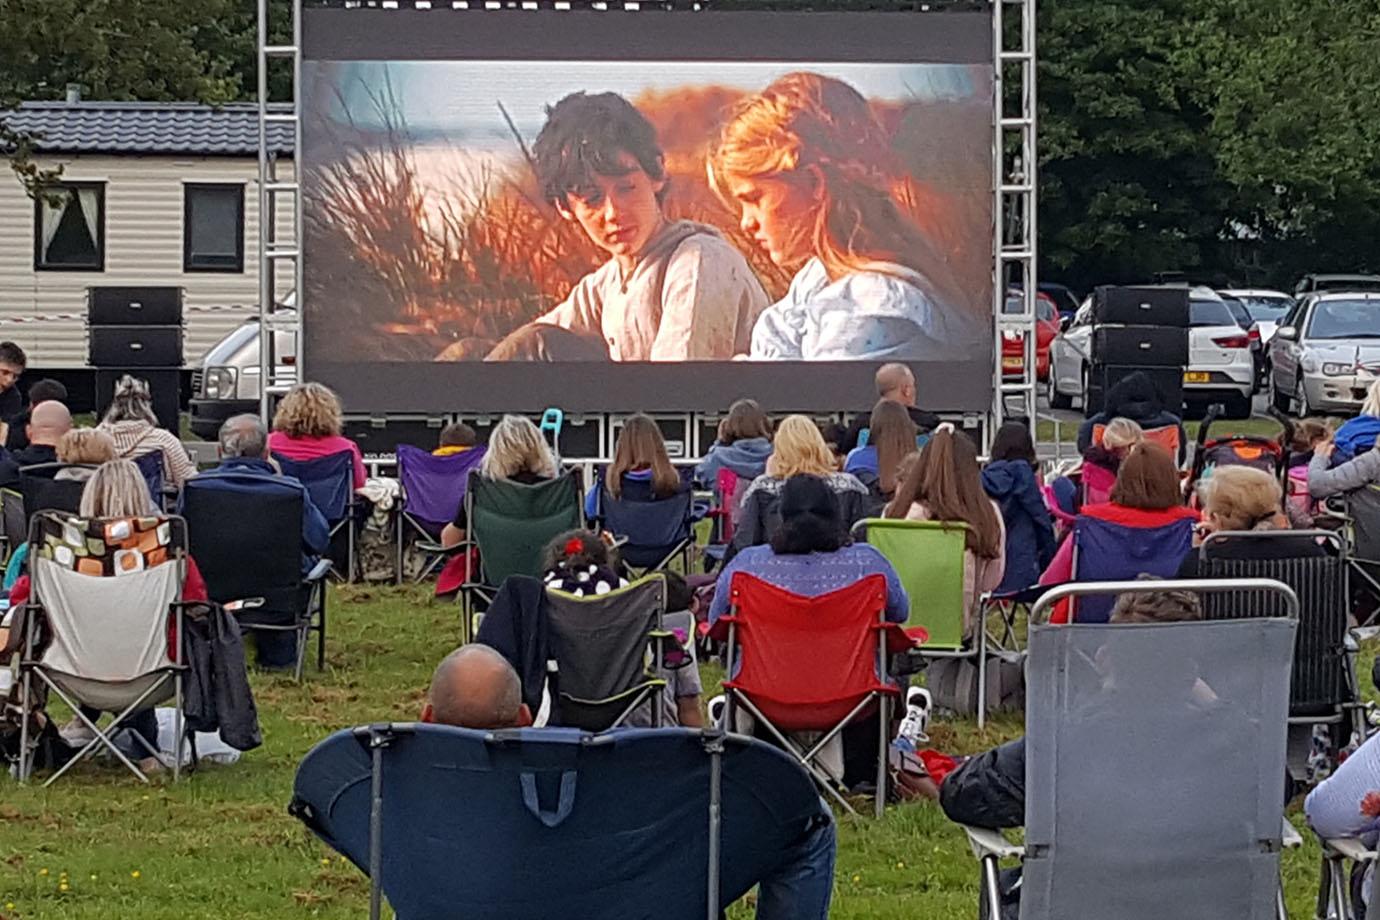 P4.81 Outdoor LED Display Screen In UK